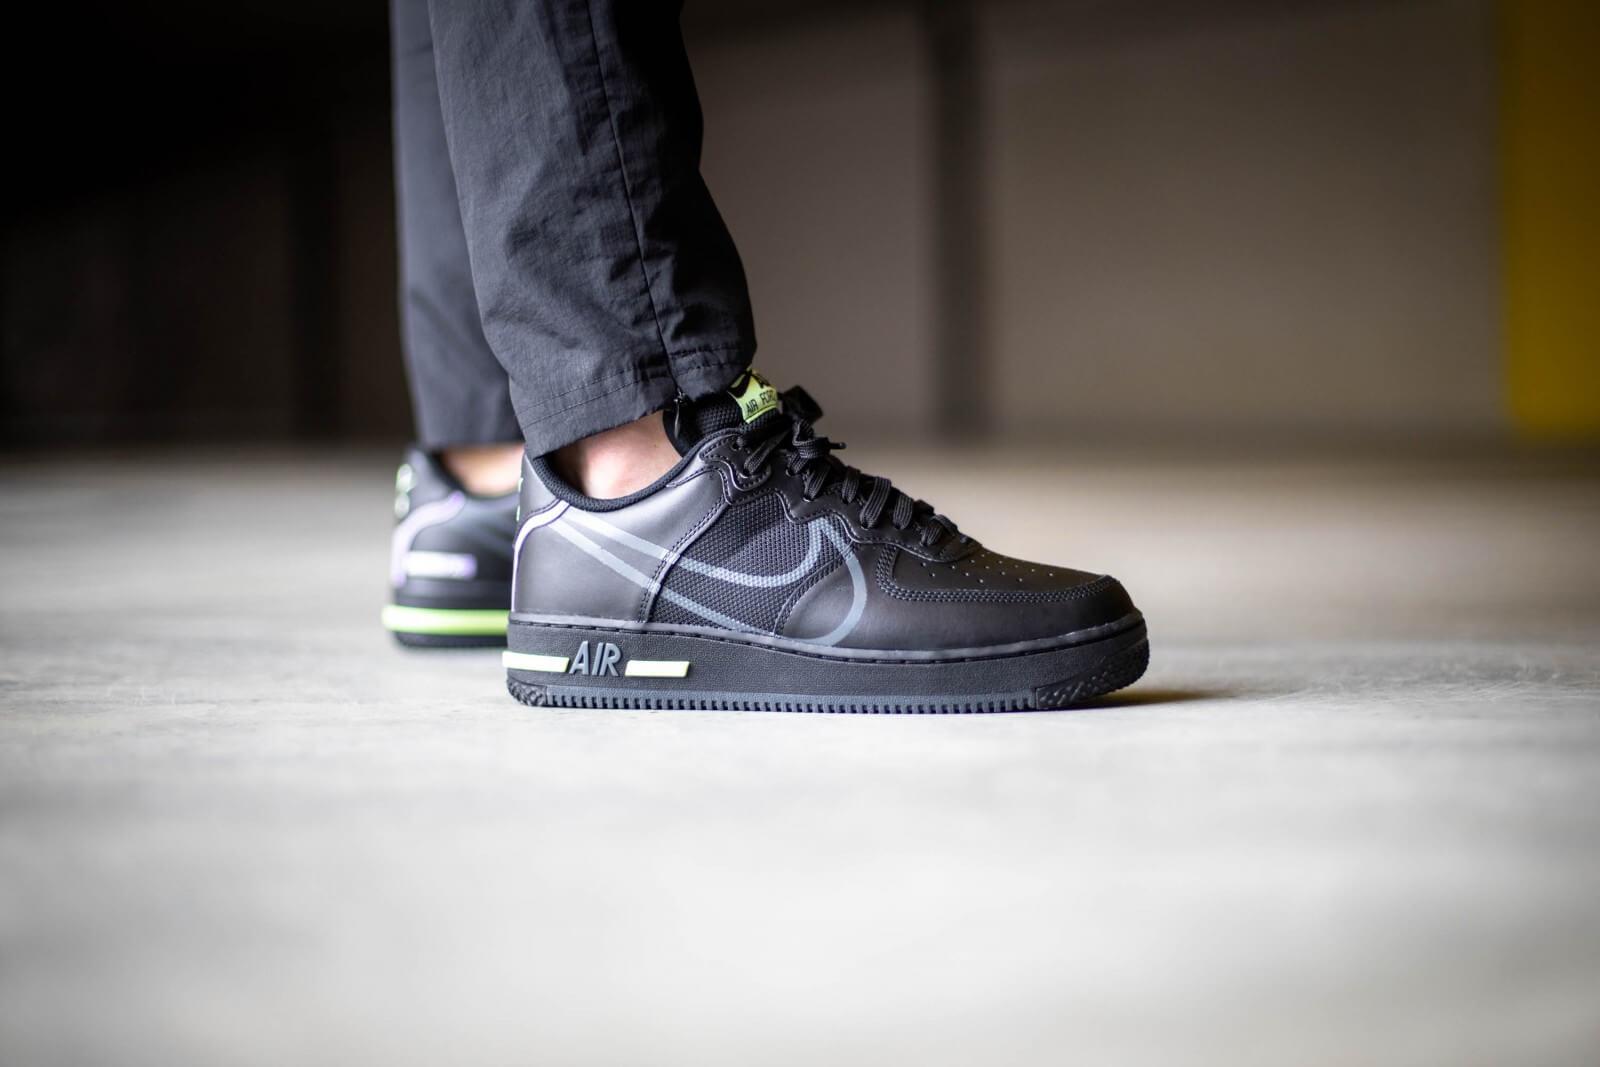 air force 1 react noir